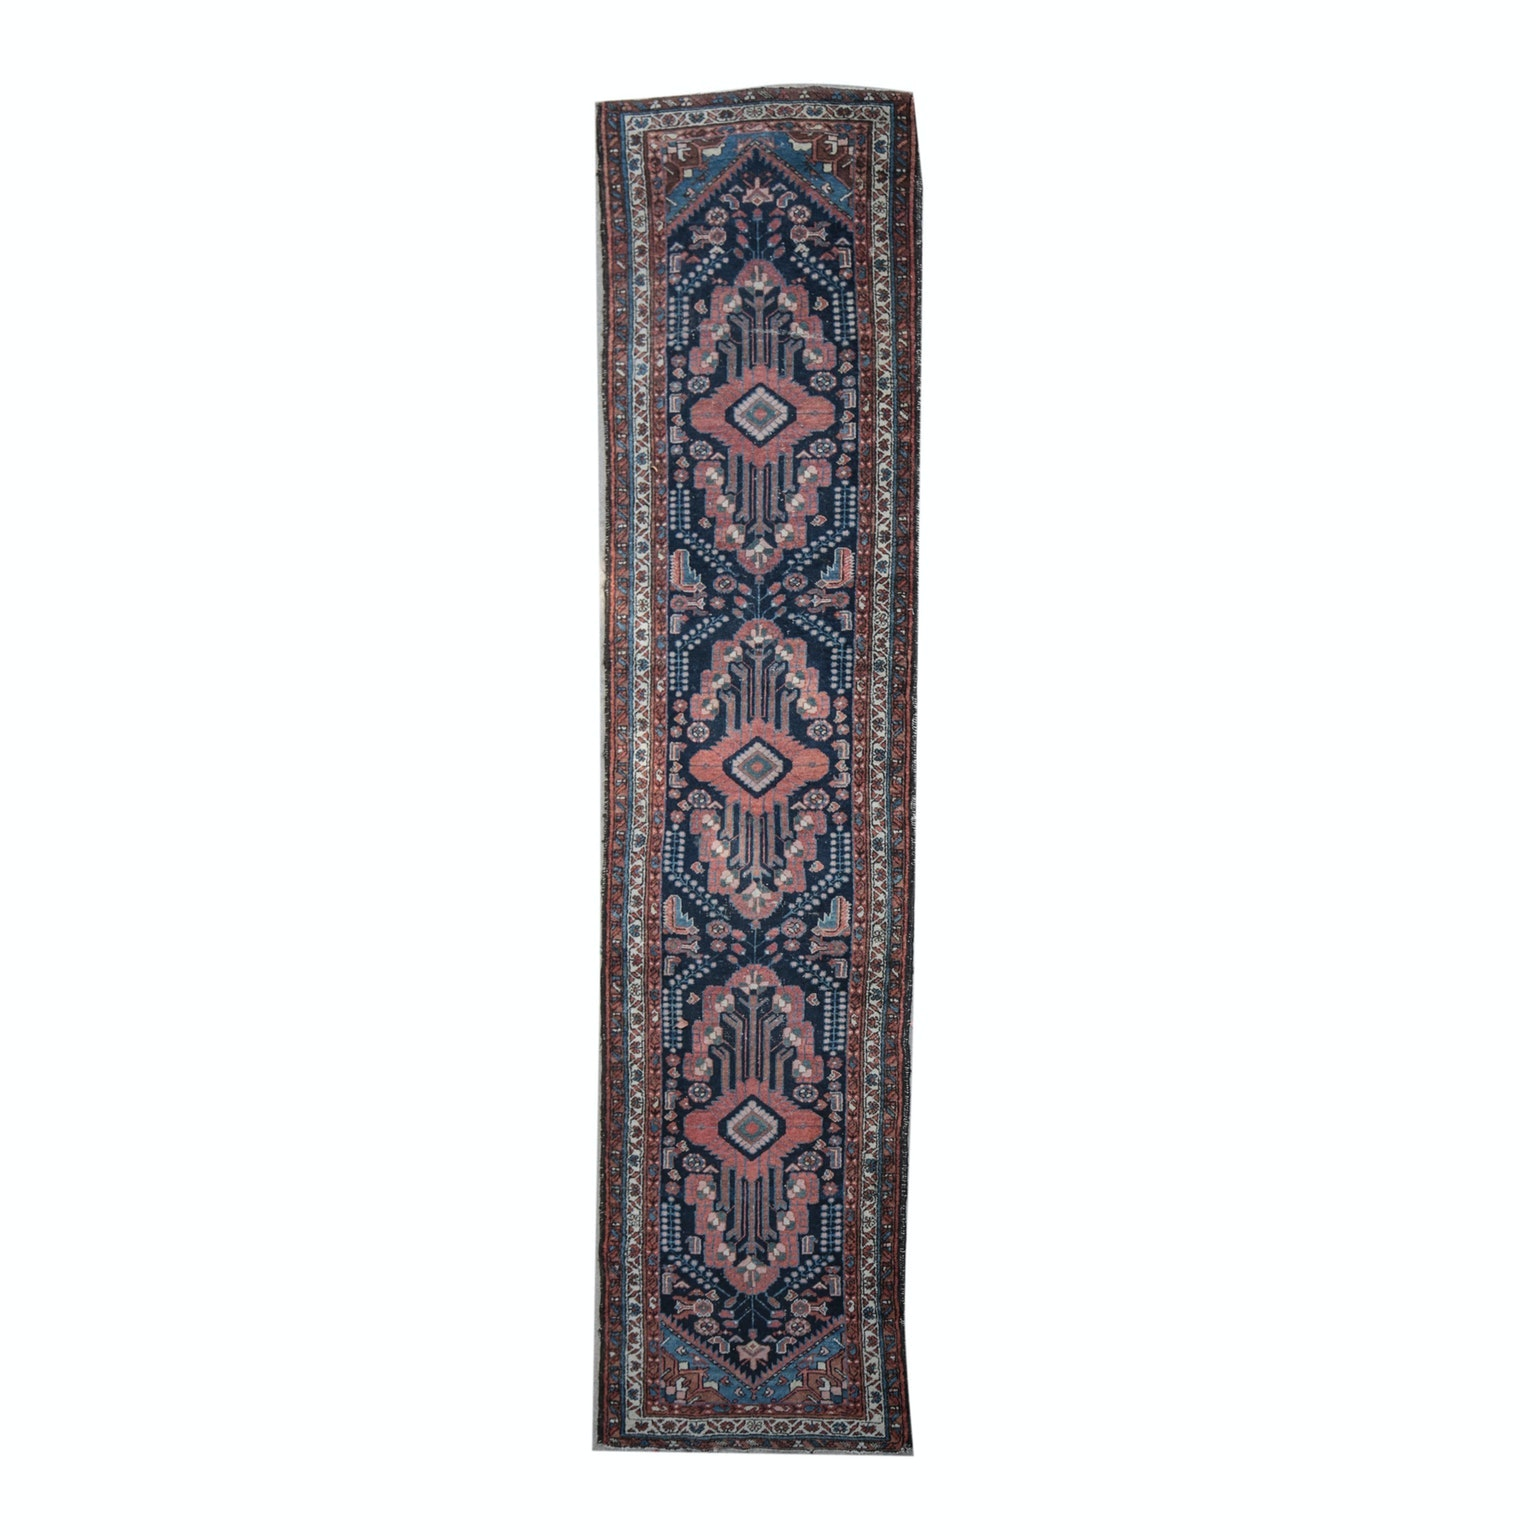 Semi-Antique to Vintage Hand-Knotted Kurdish Wool Carpet Runner